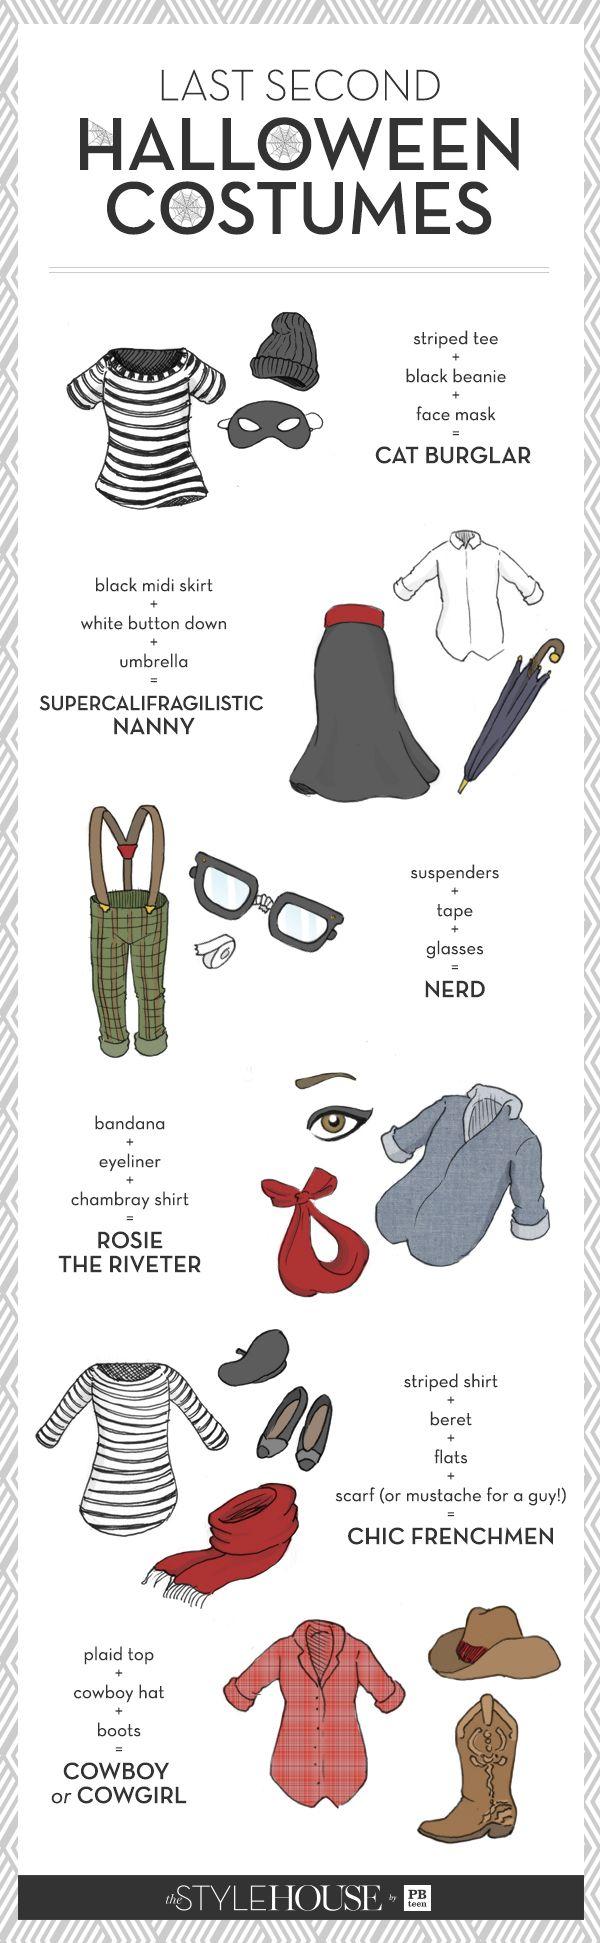 last second halloween costumes //supercalifragilistic nanny // cat burglar // nerd // rosie the riveter // chic frenchmen // cowboy/cowgirl